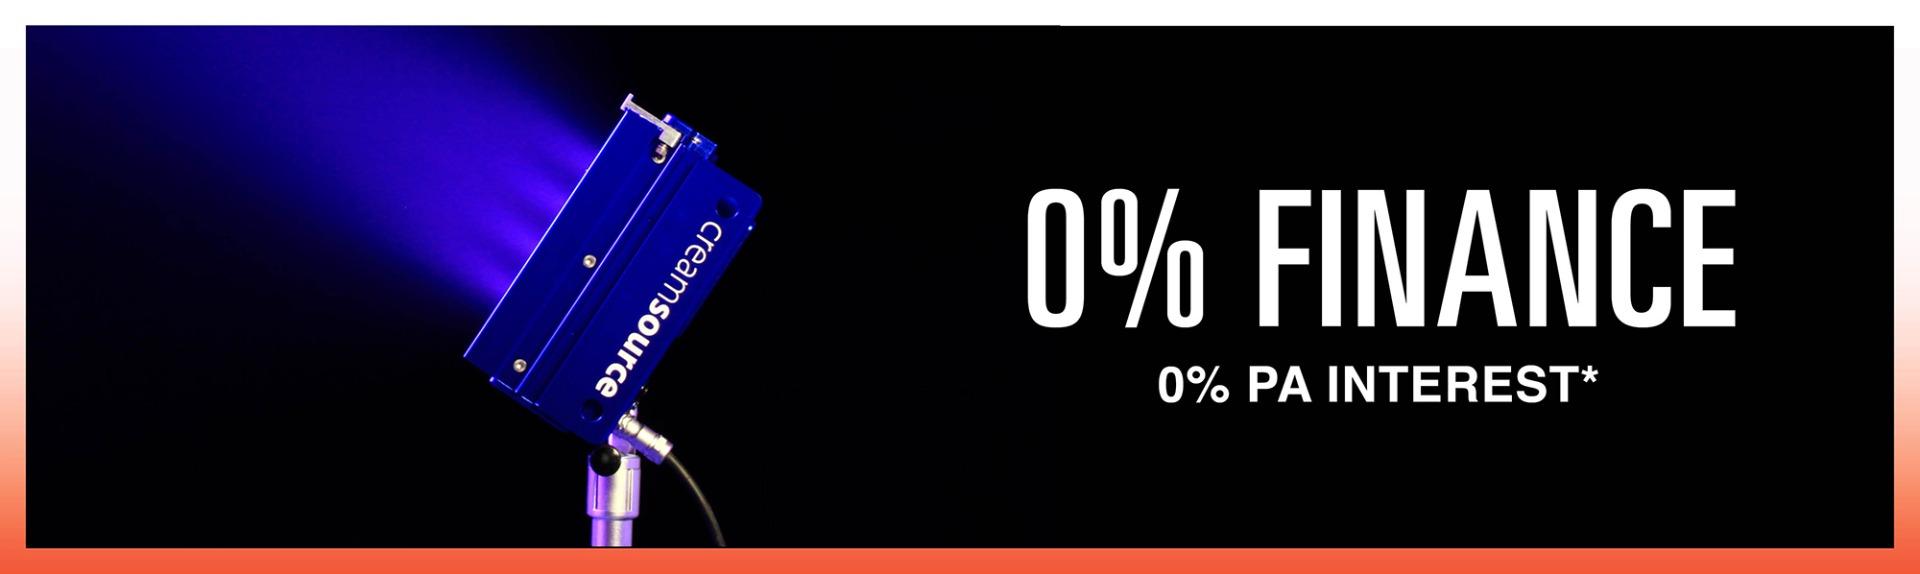 SUNSTUDIOS 0 percent interest finance offer